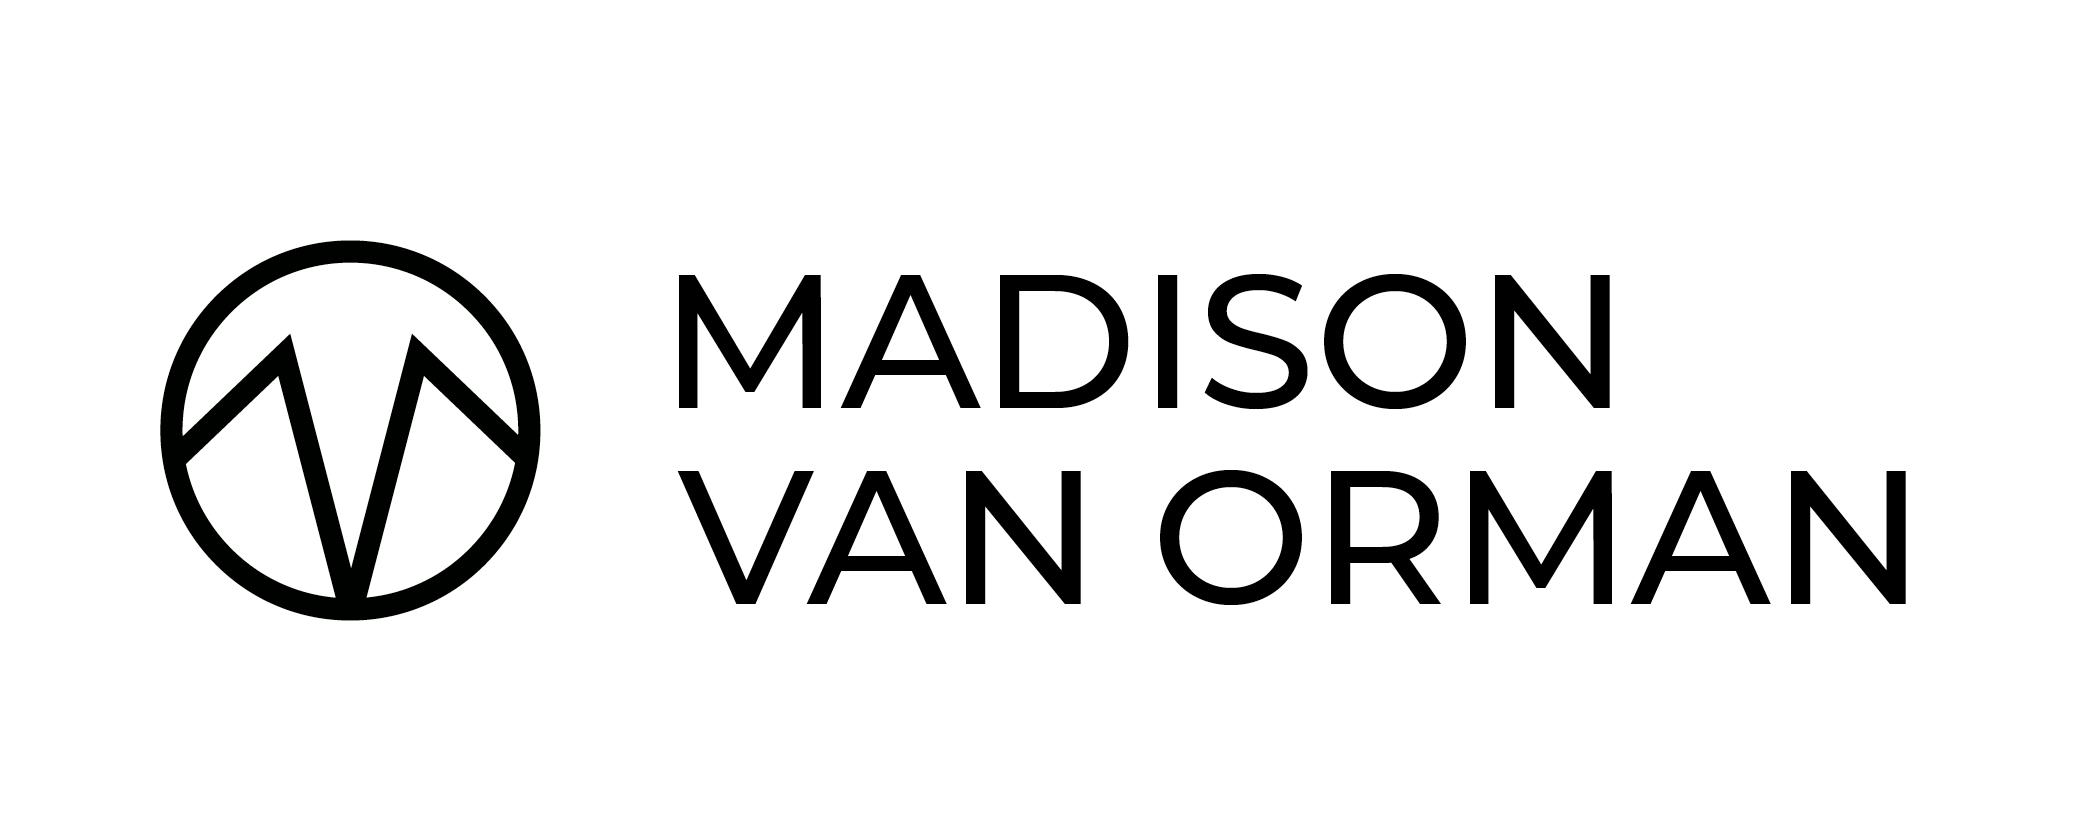 Madison Van Orman